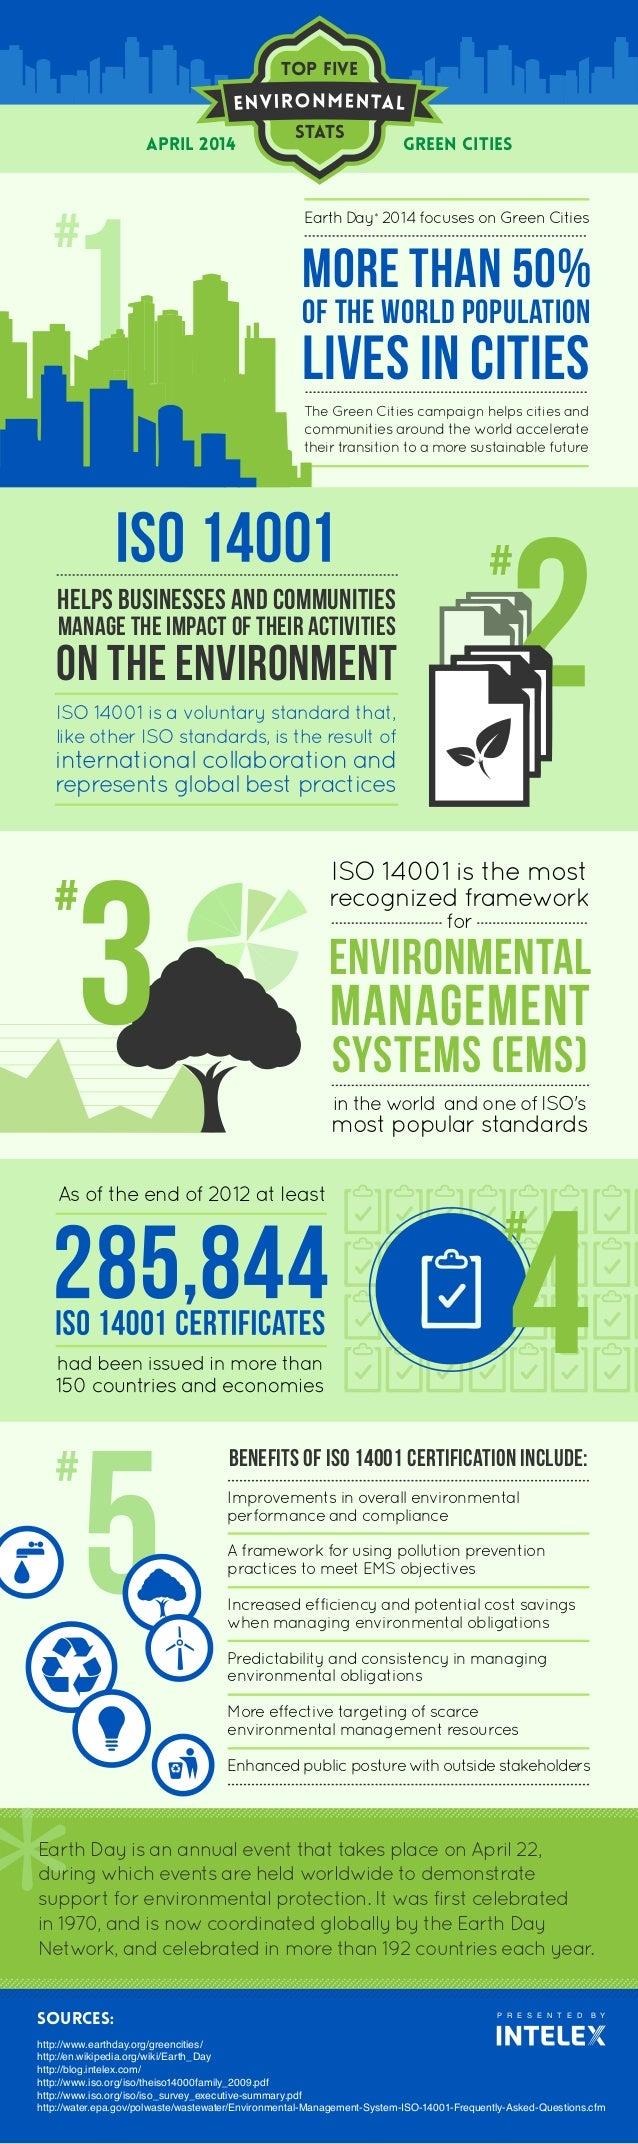 Top Five Environmental Statistics – Green Cities (Infographic)